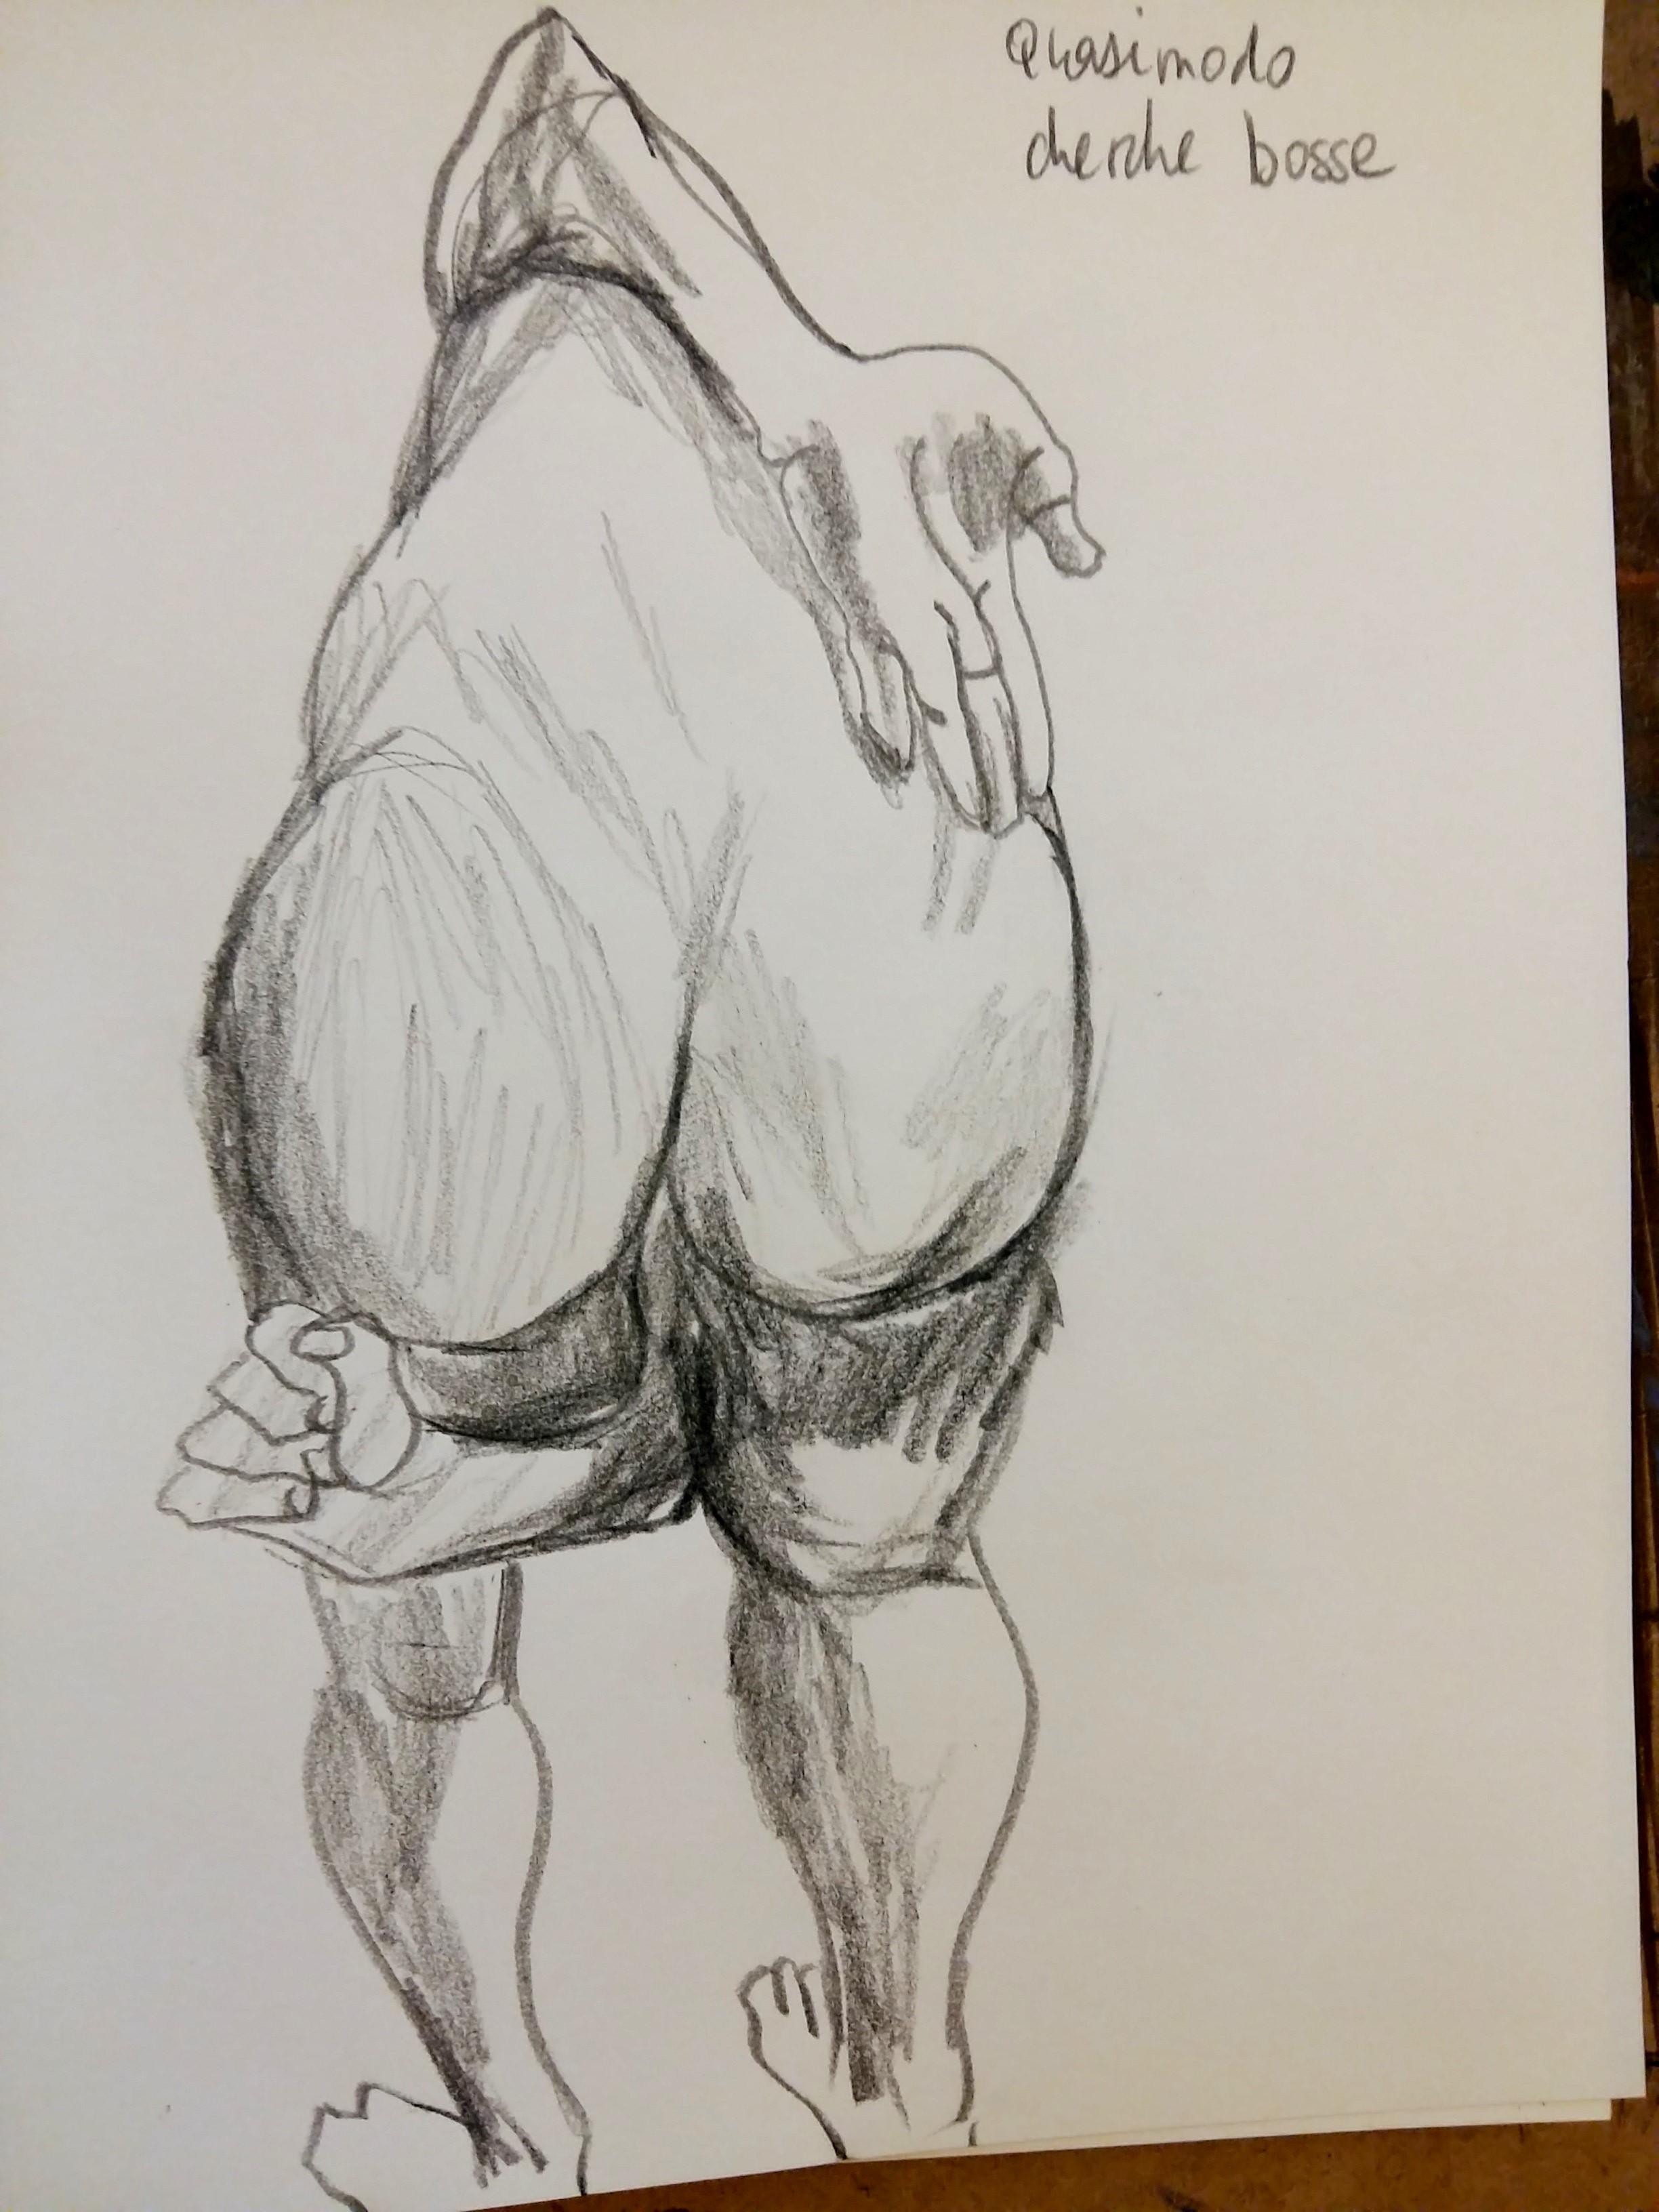 Dessin de dos crayon papier hachures raccourci perspectives  cours de dessin